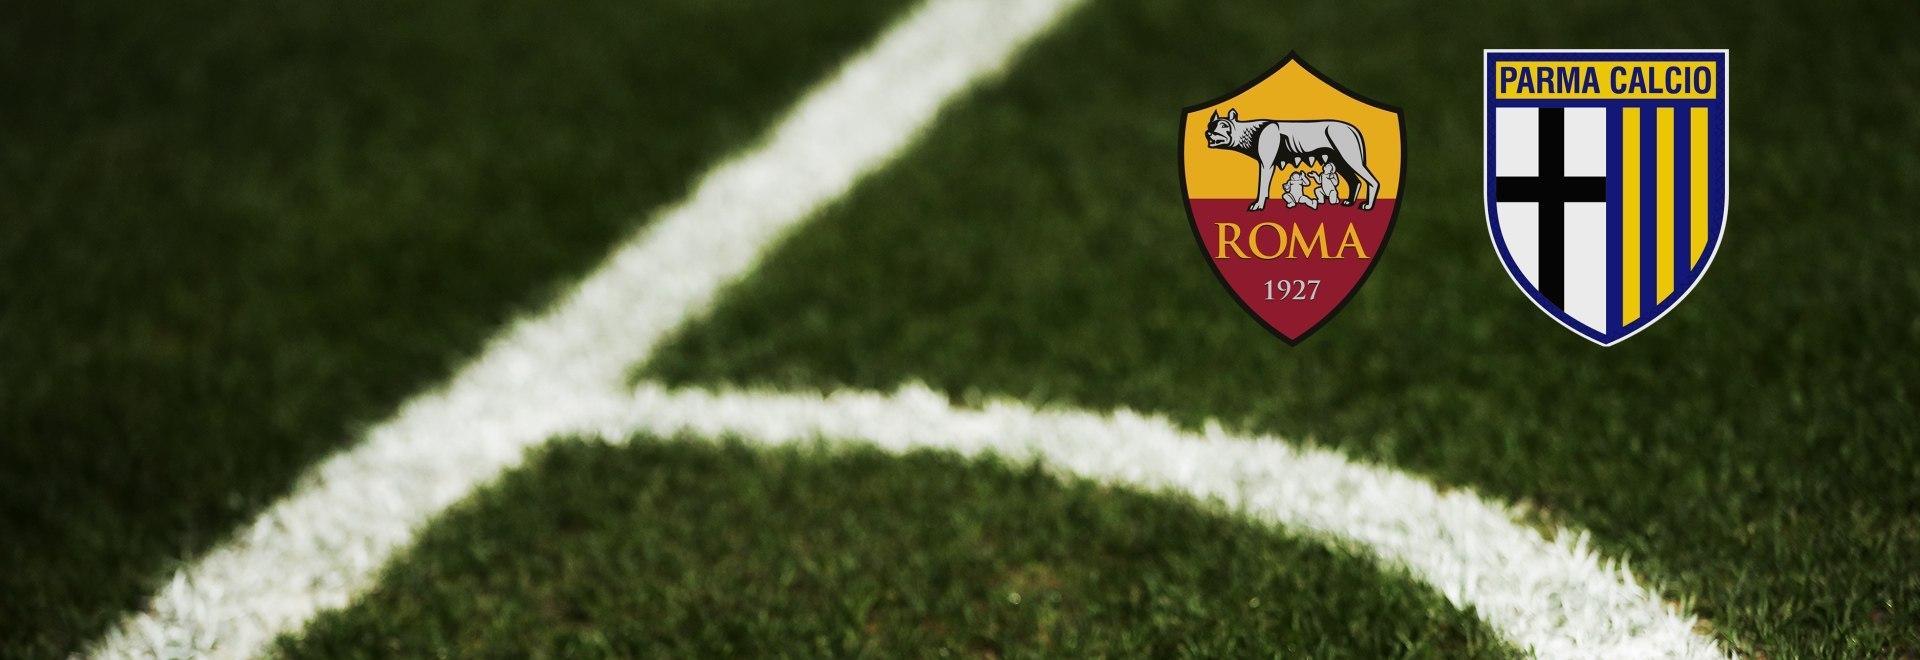 Roma - Parma. 31a g.